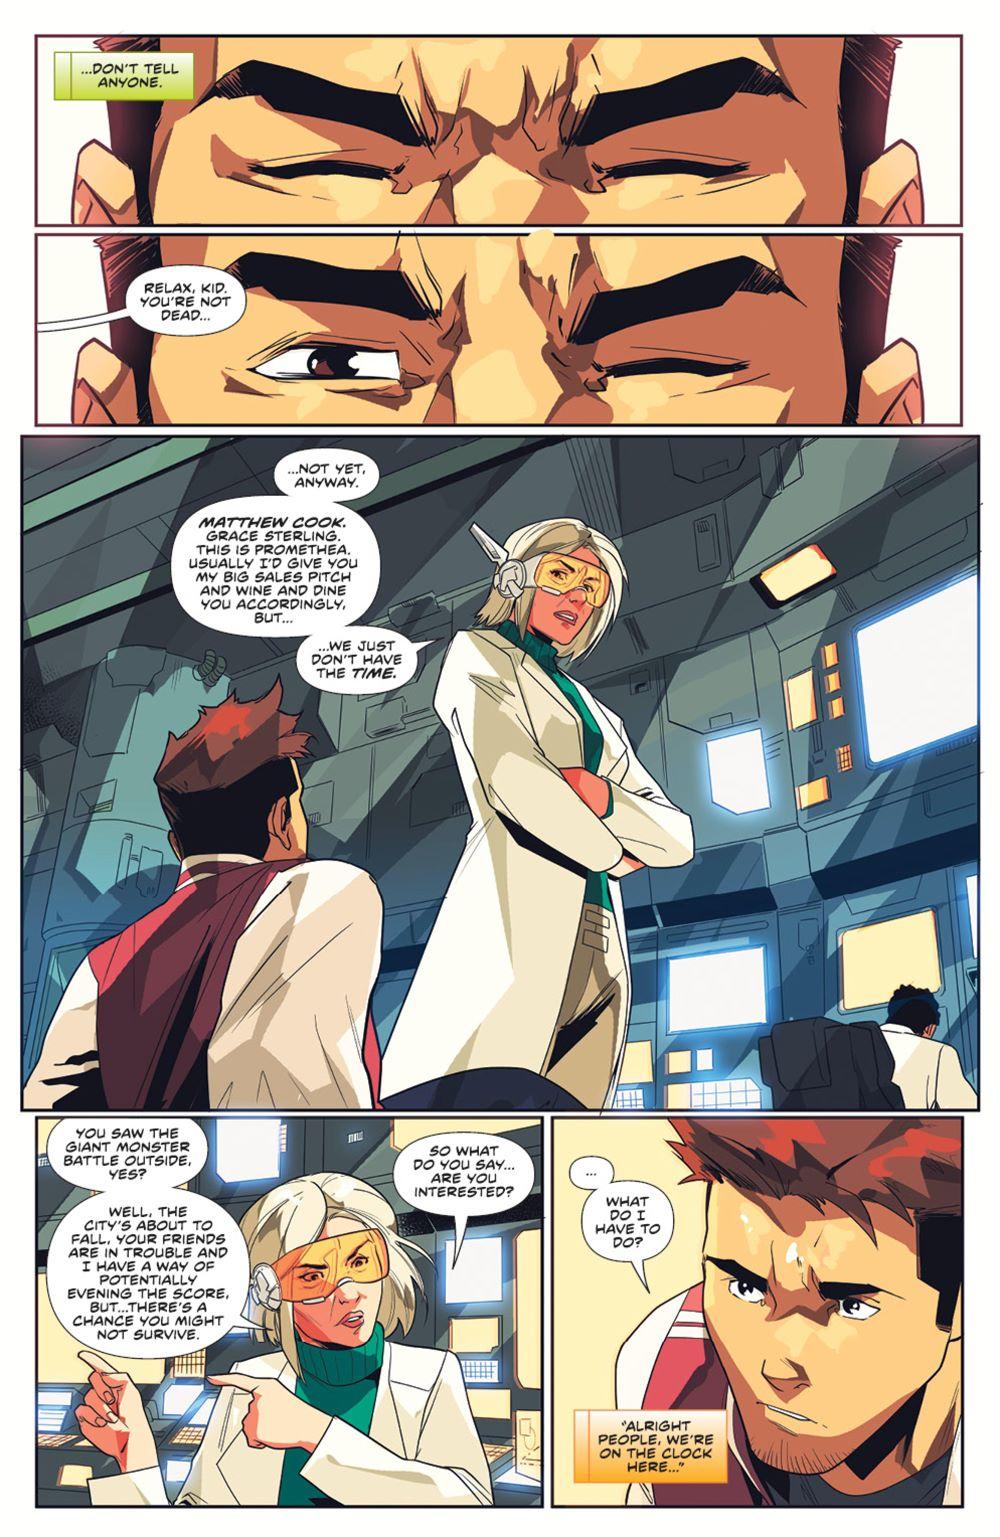 MightyMorphin_005_PRESS_4 ComicList Previews: MIGHTY MORPHIN #5